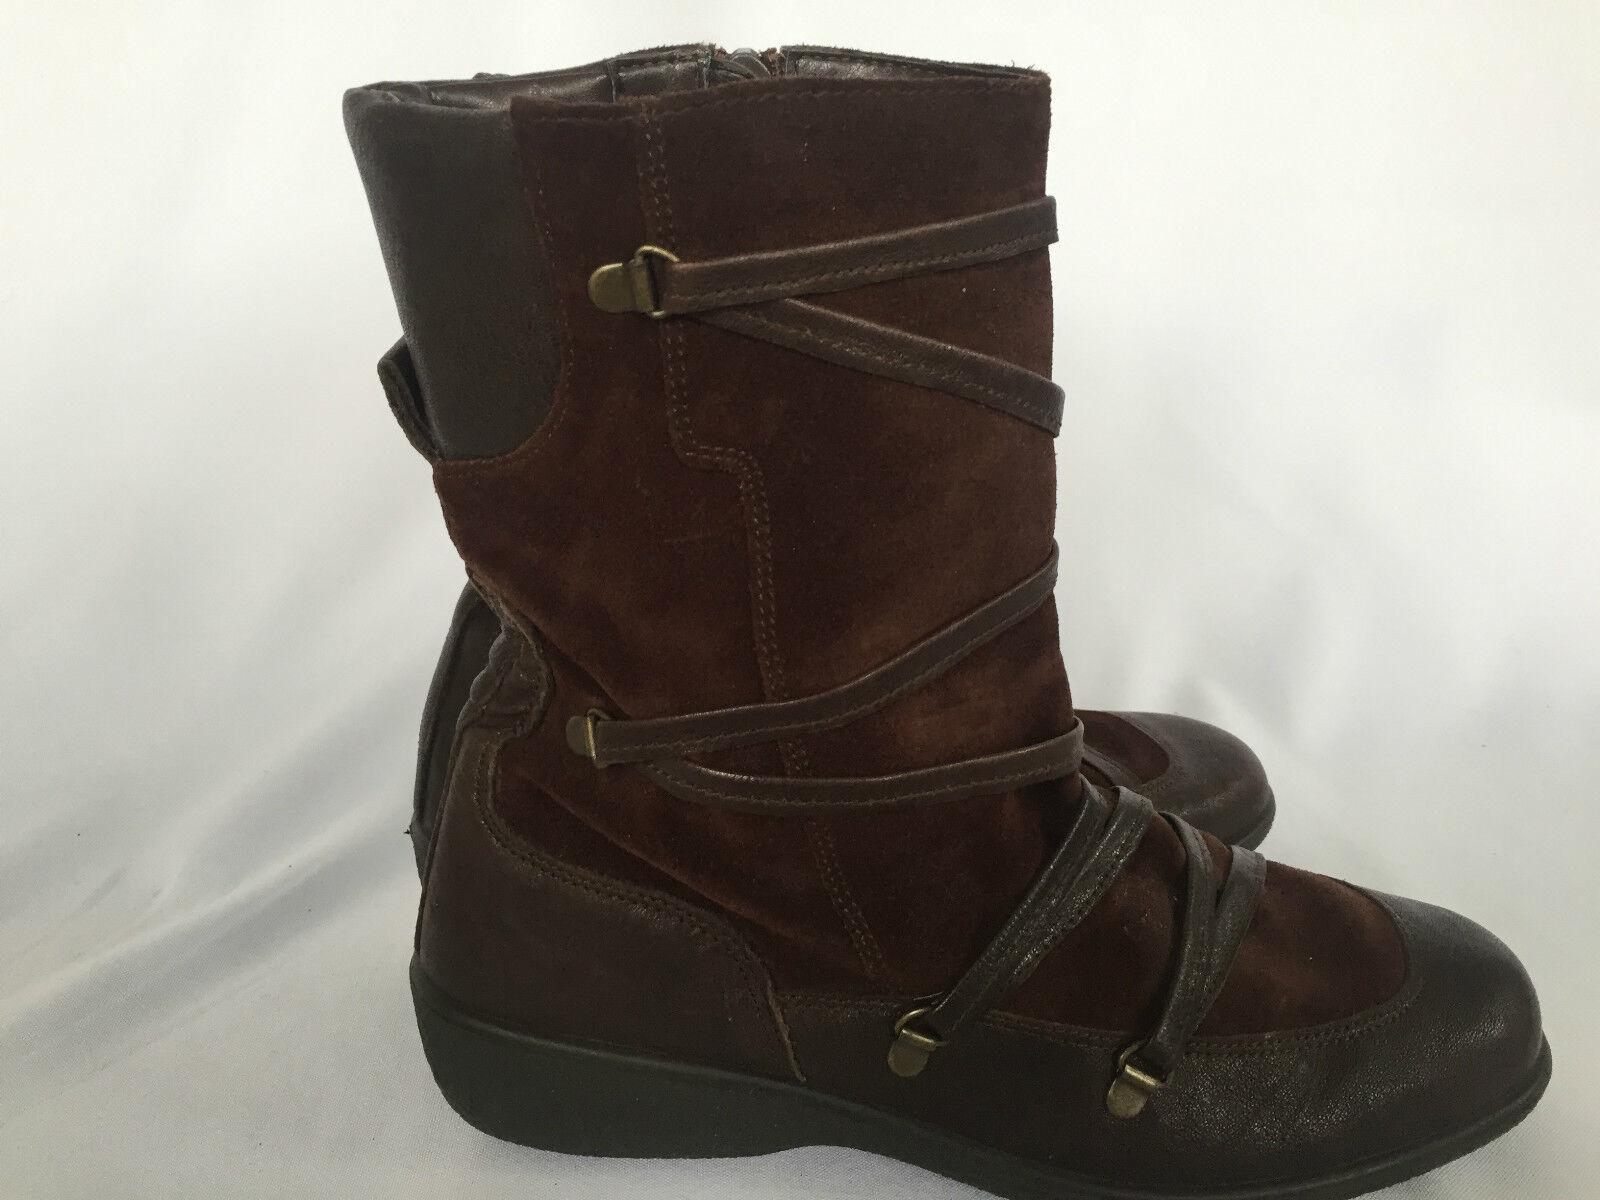 Ankle Boots Aerosoles Brown Suede Leather Zip Medium Heel Size 9 Medium